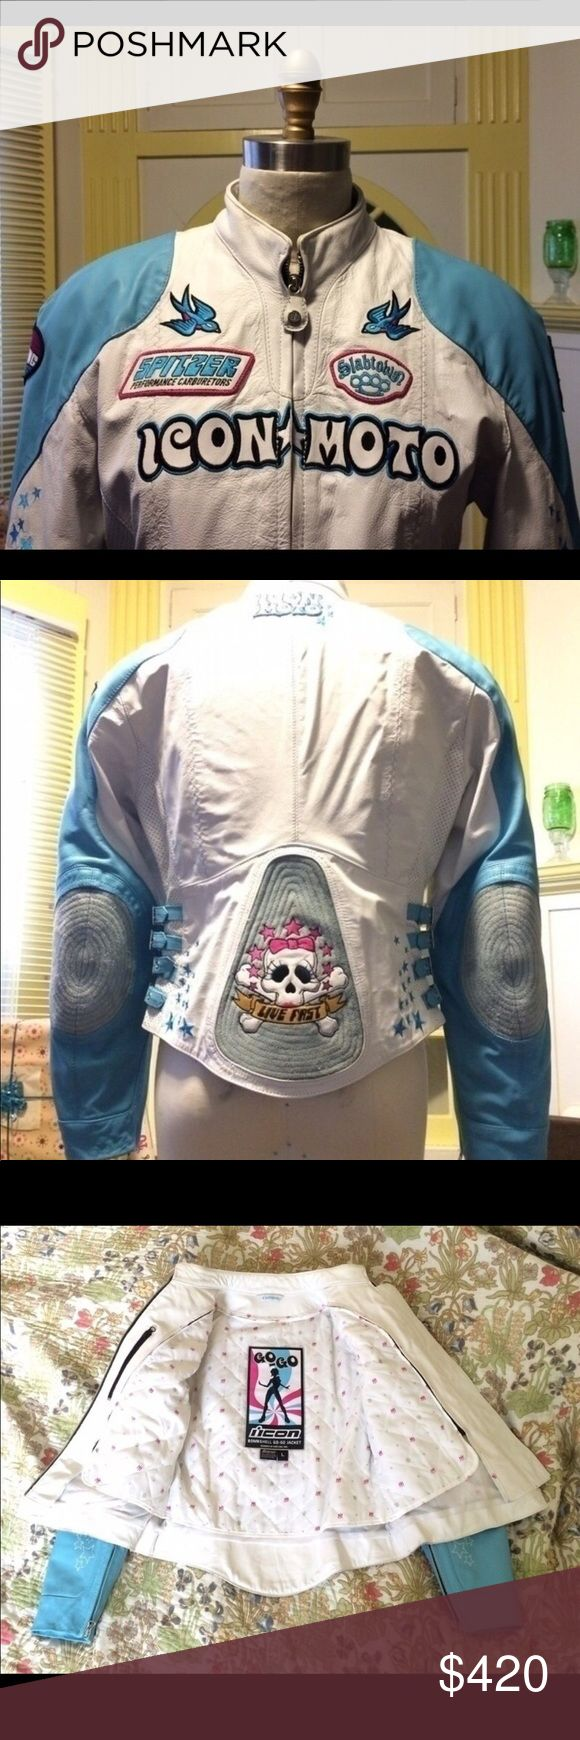 best 20+ icon motorcycle jacket ideas on pinterest | triumph